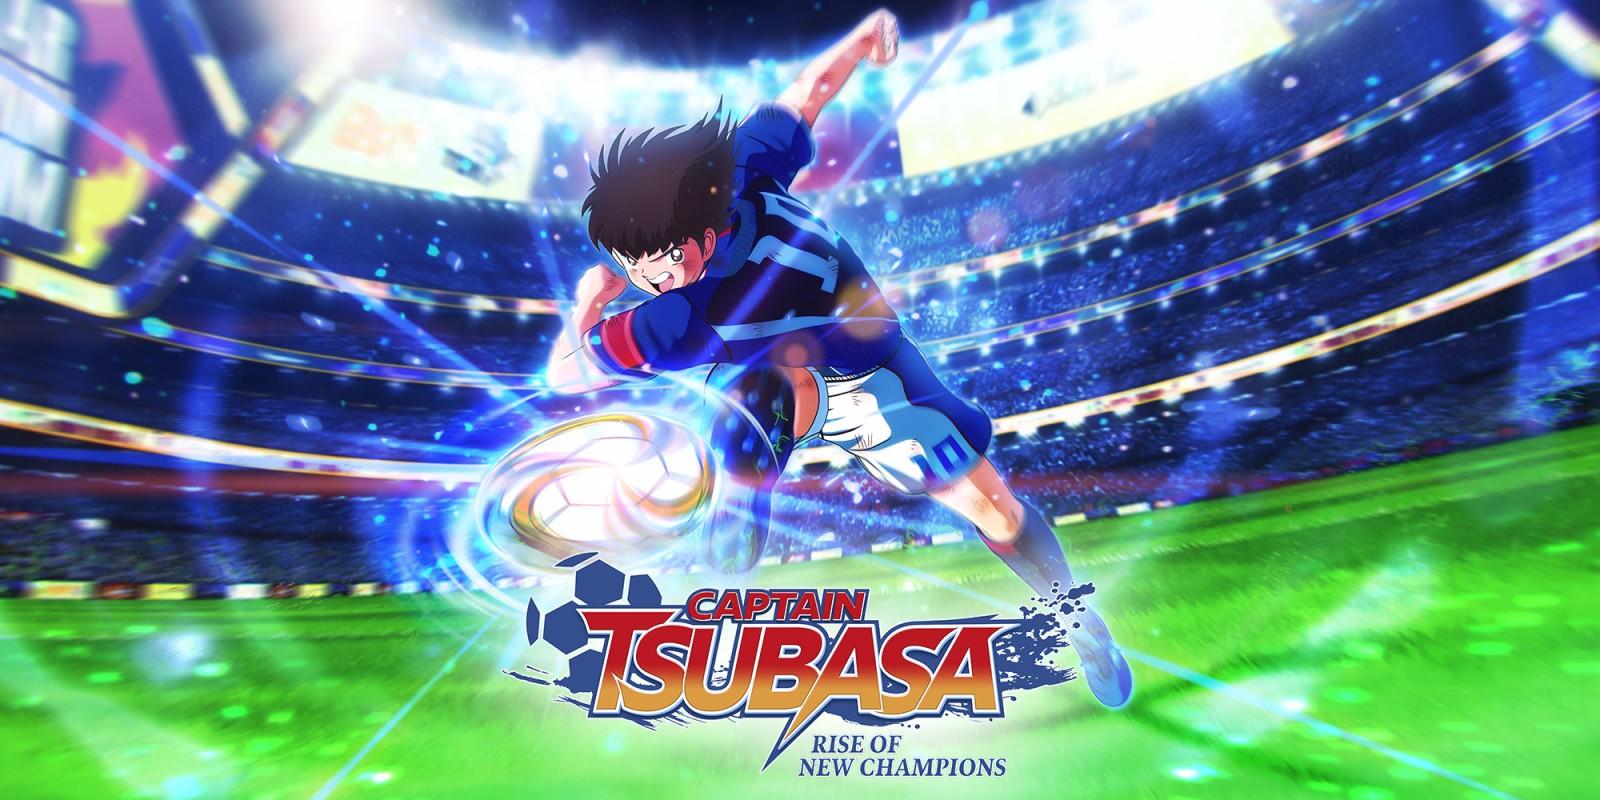 Download Captain Tsubasa: Rise of New Champions v1.30.0-P2P